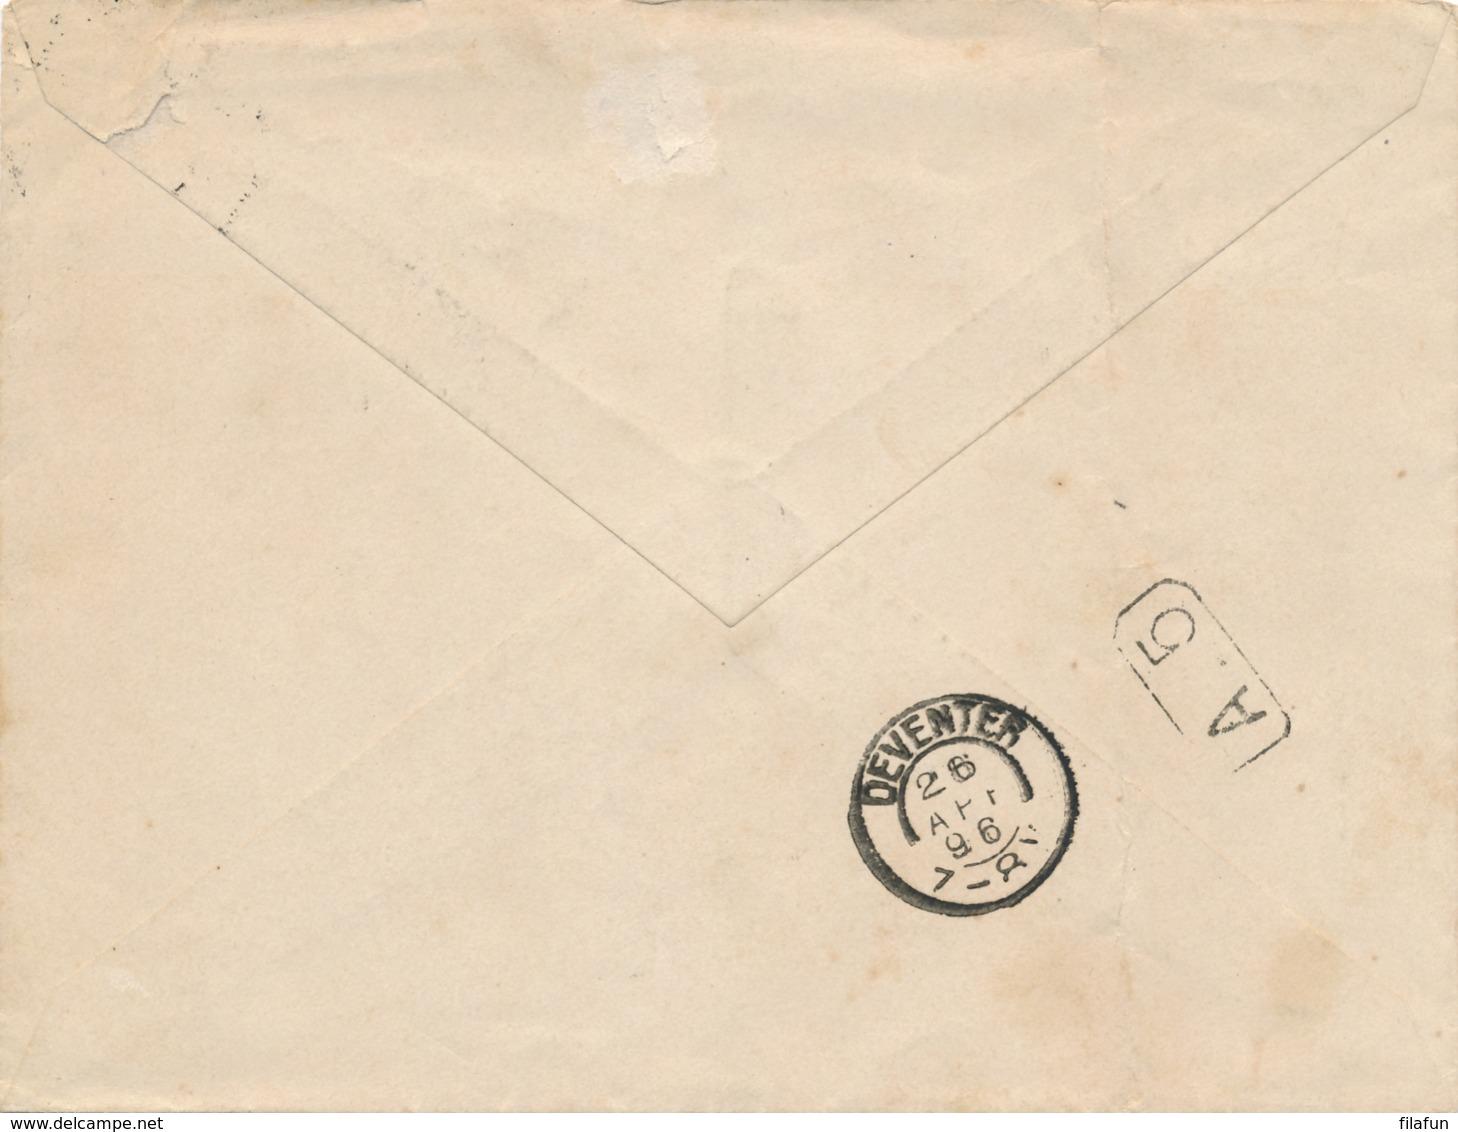 Nederland - 1896 - 5 Cent Hangend Haar, Envelop G6a Van KR Zaltbommel Naar Deventer - Periode 1891-1948 (Wilhelmina)